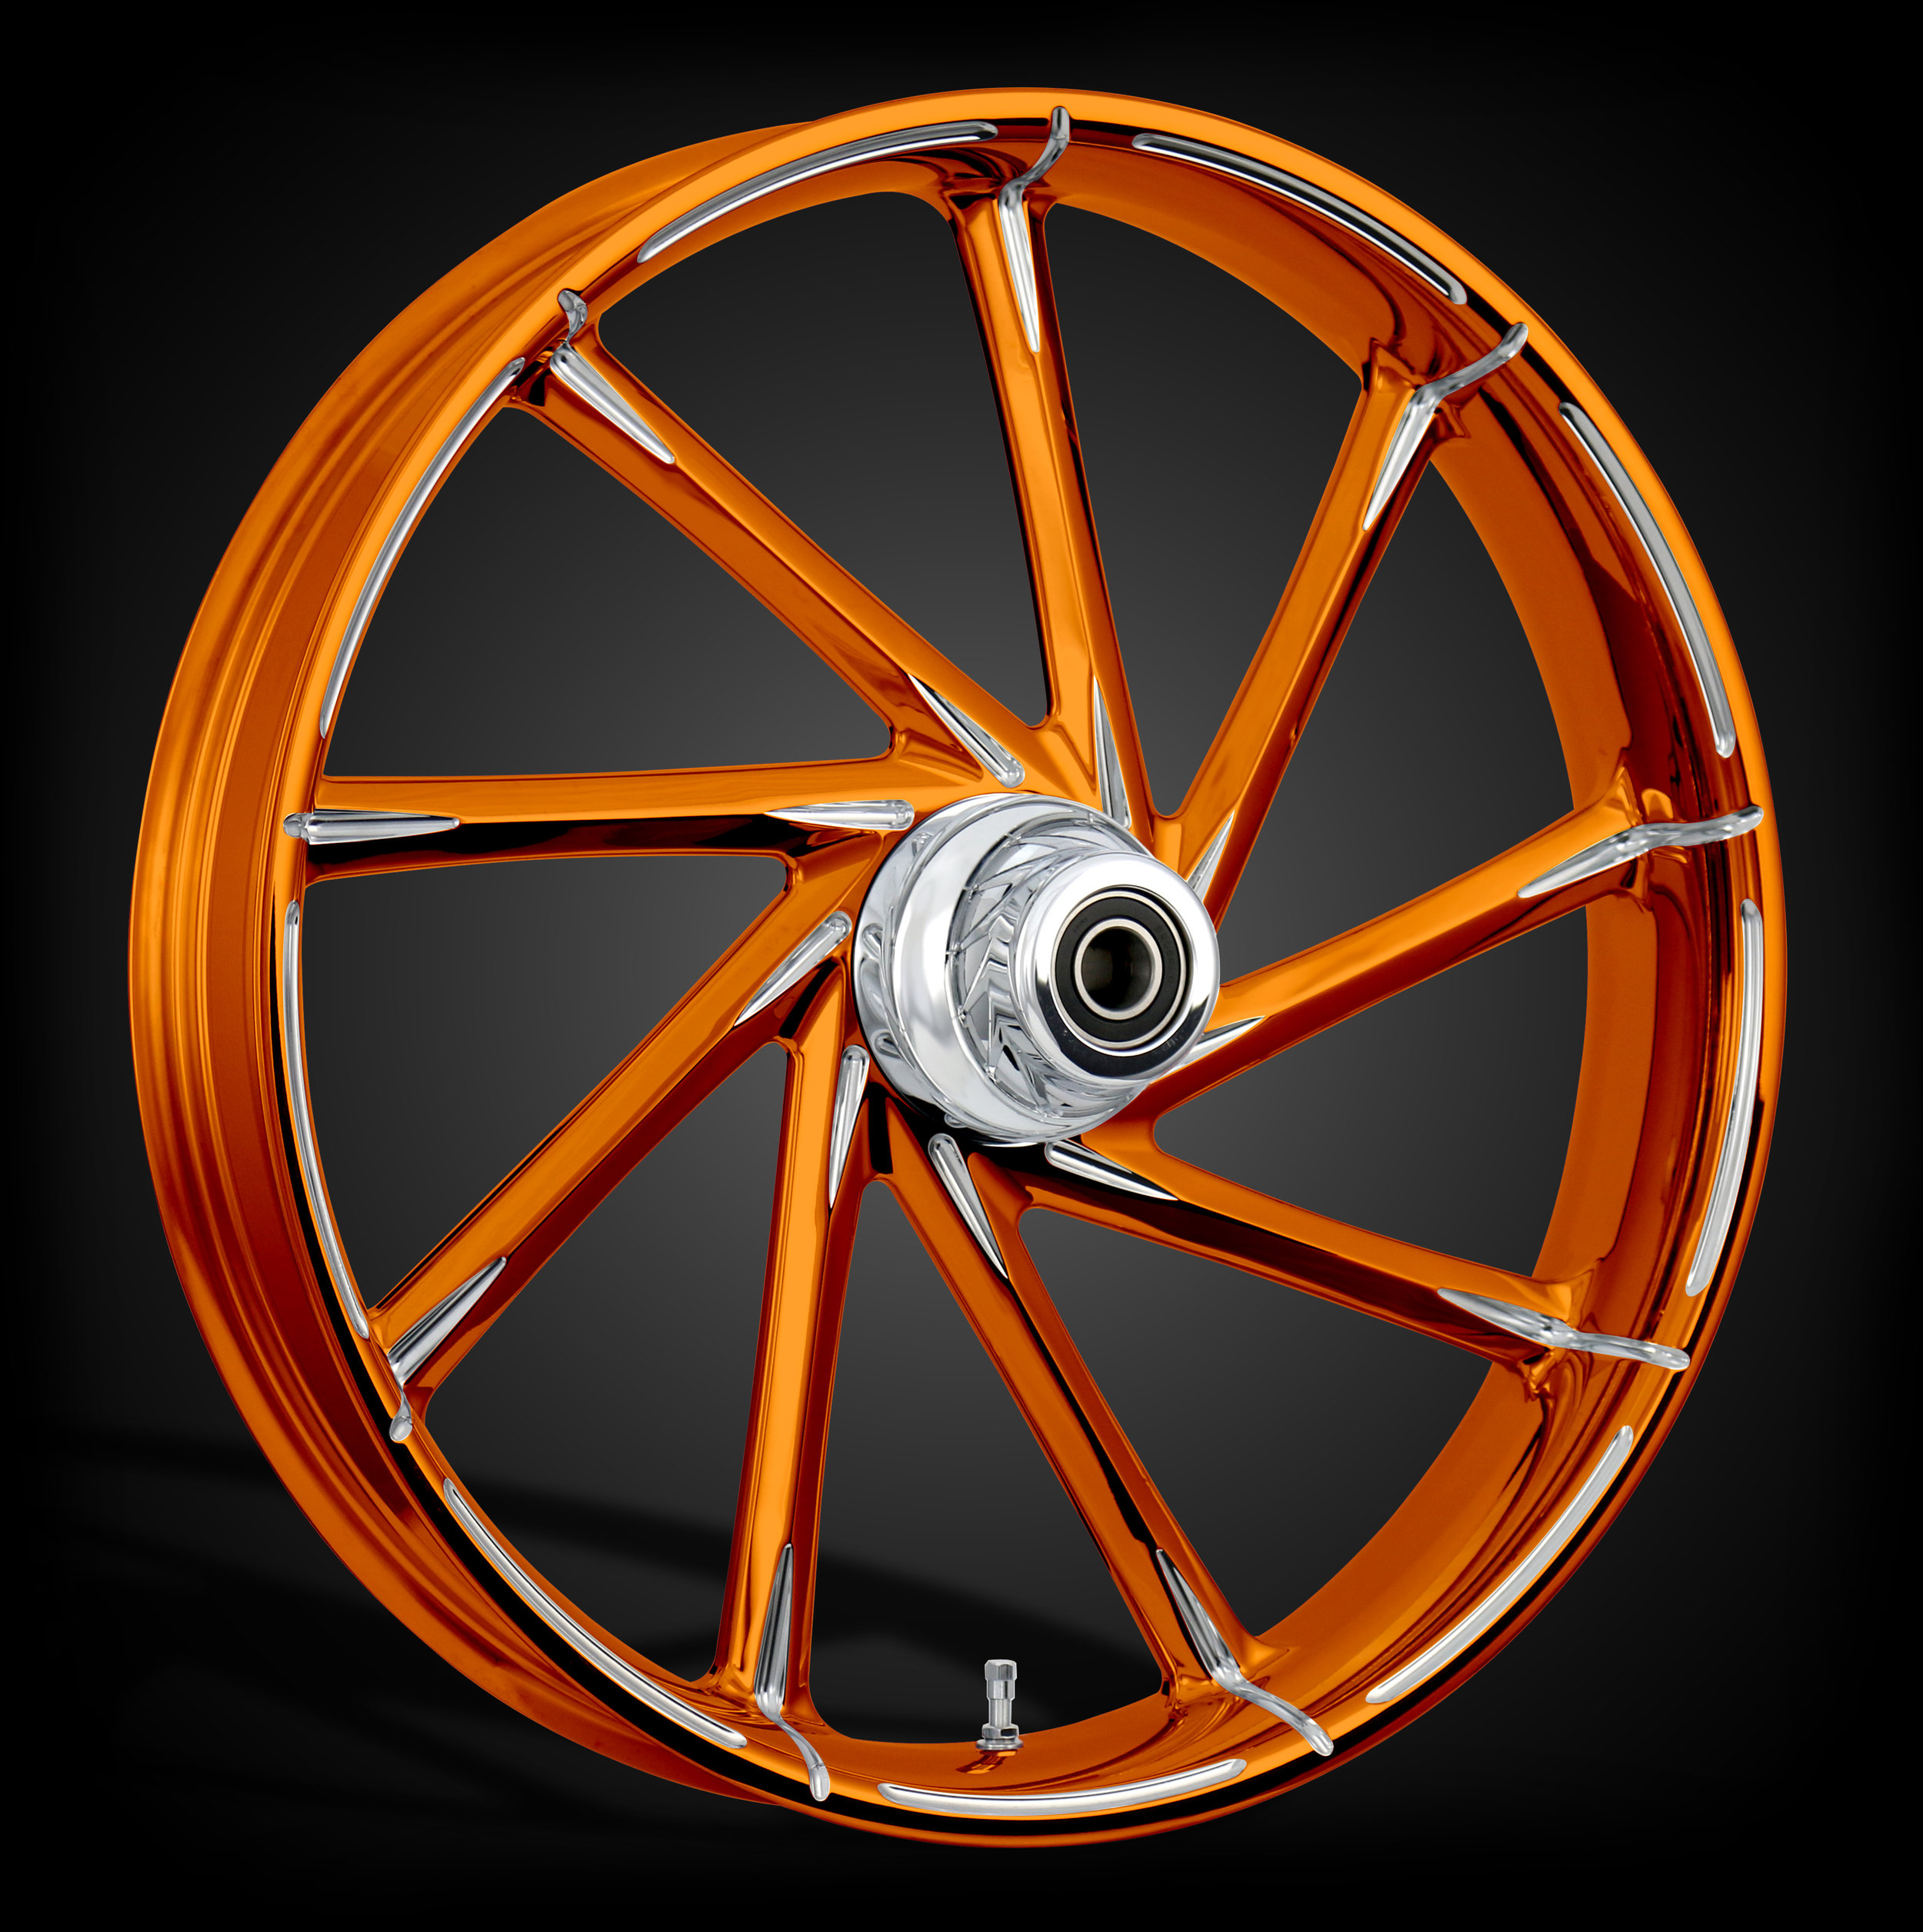 Kinetic-Dye-Line-orange.jpg